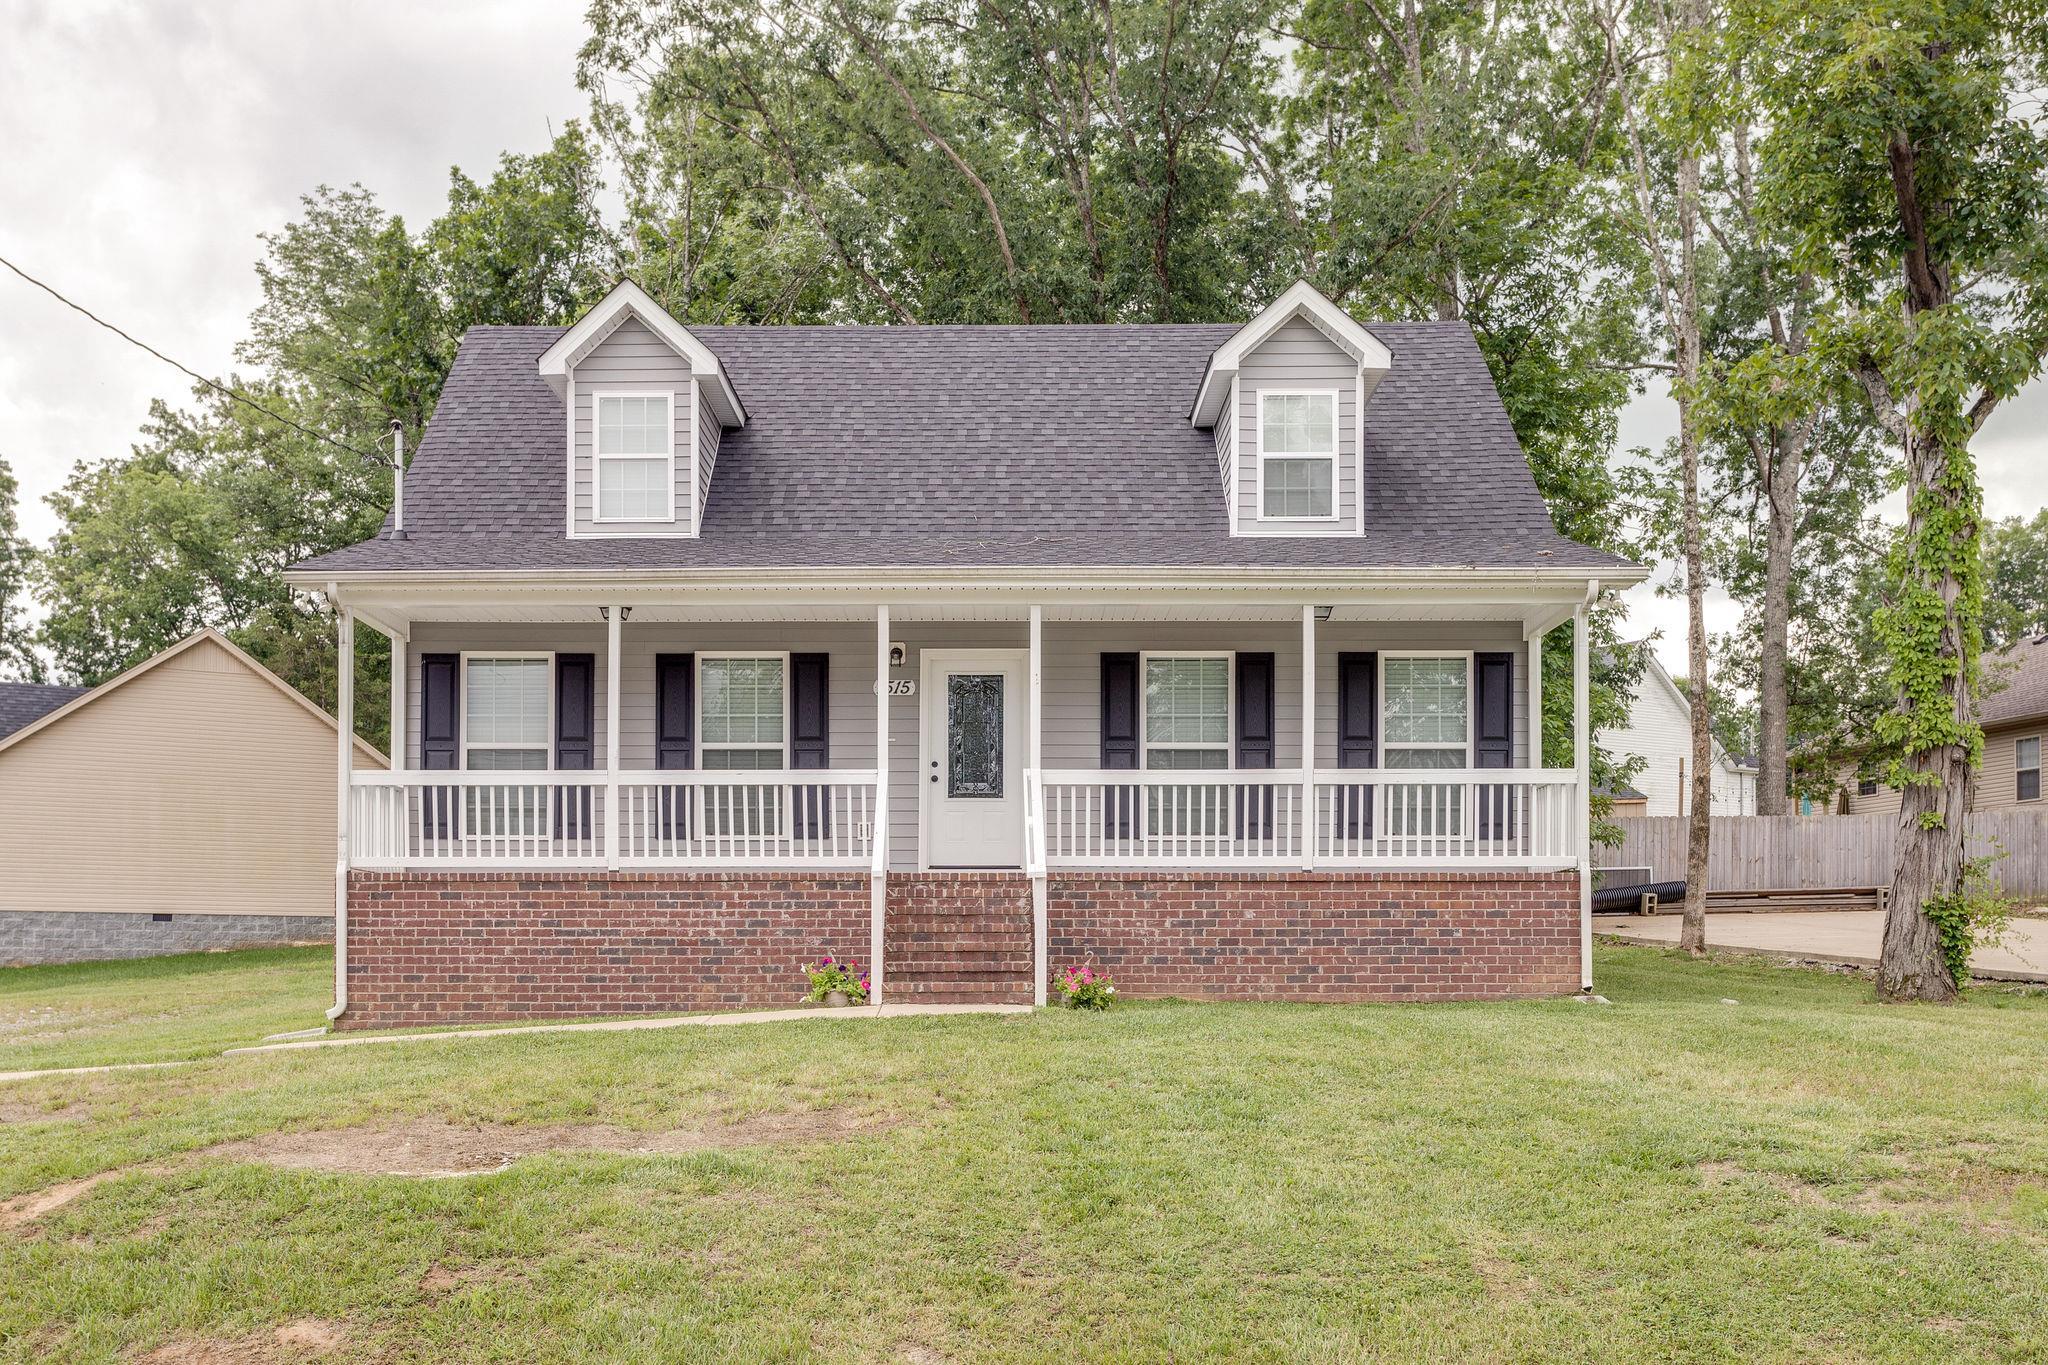 1515 Joanne Cir, Lewisburg, TN 37091 - Lewisburg, TN real estate listing